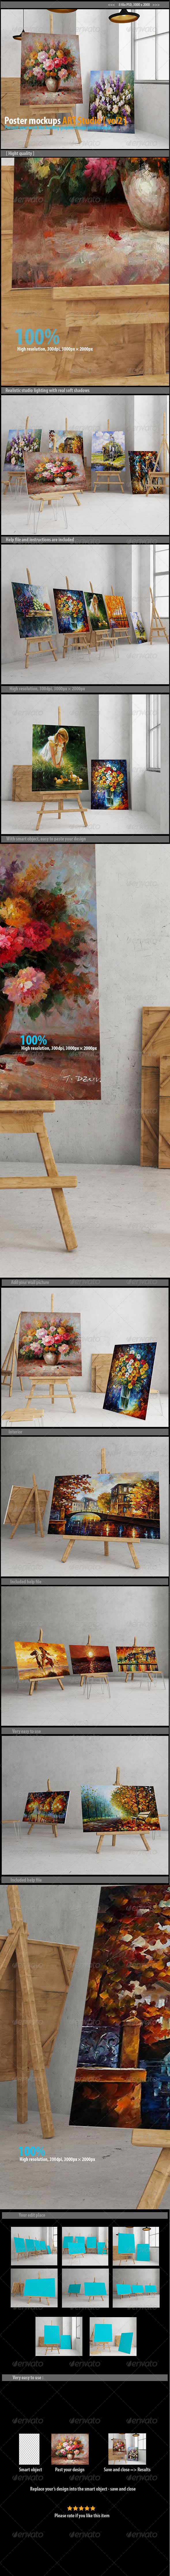 GraphicRiver Poster mockups ART Studio [vol2] 7951173